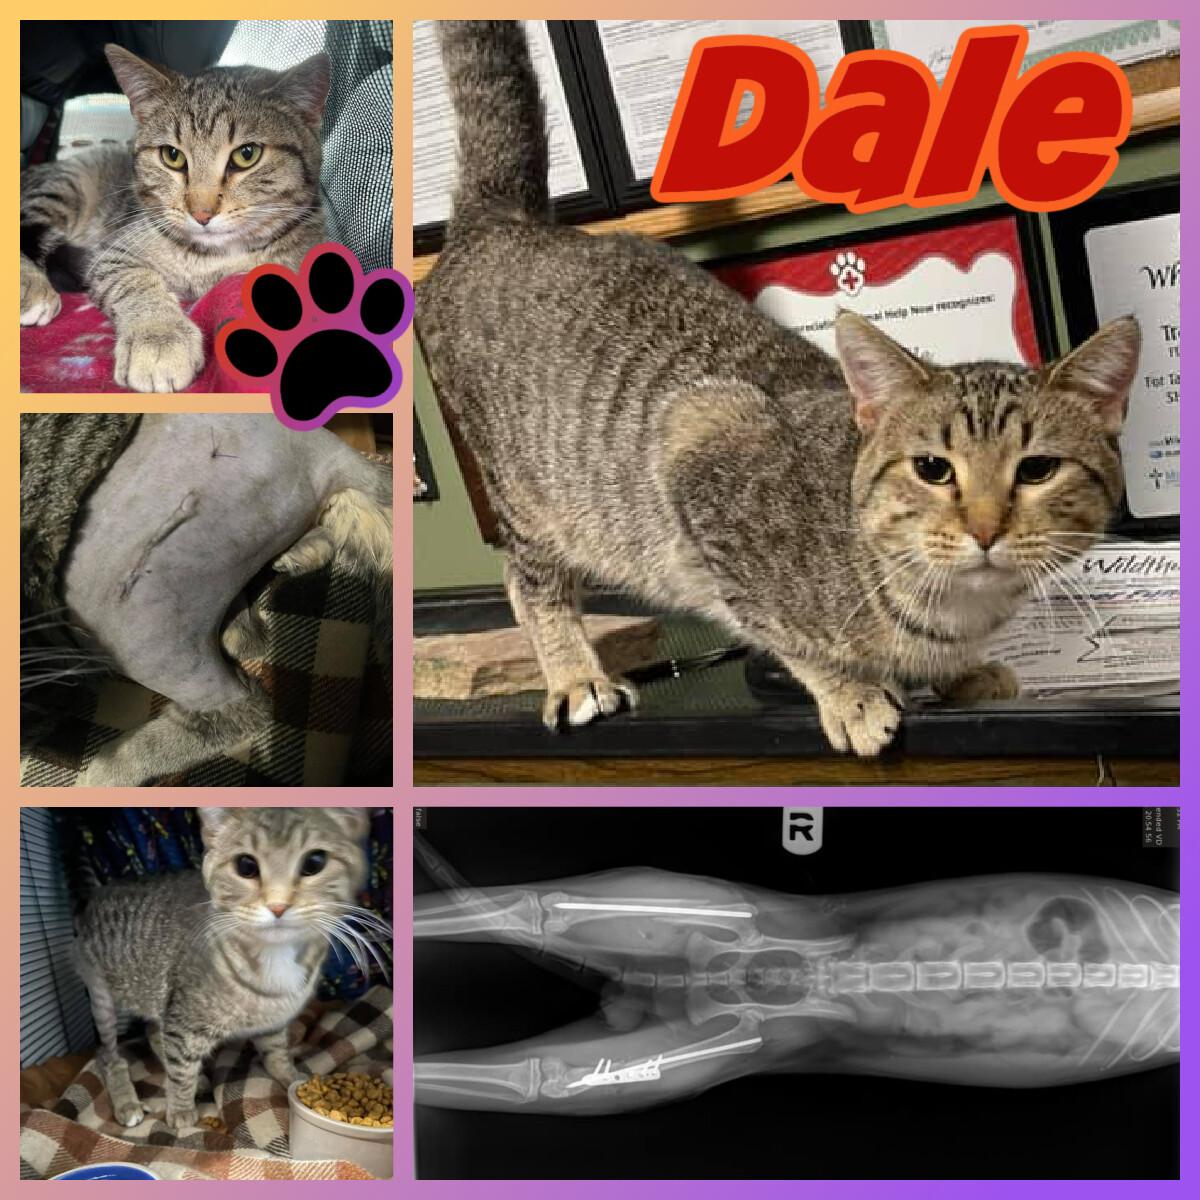 Dale detail page